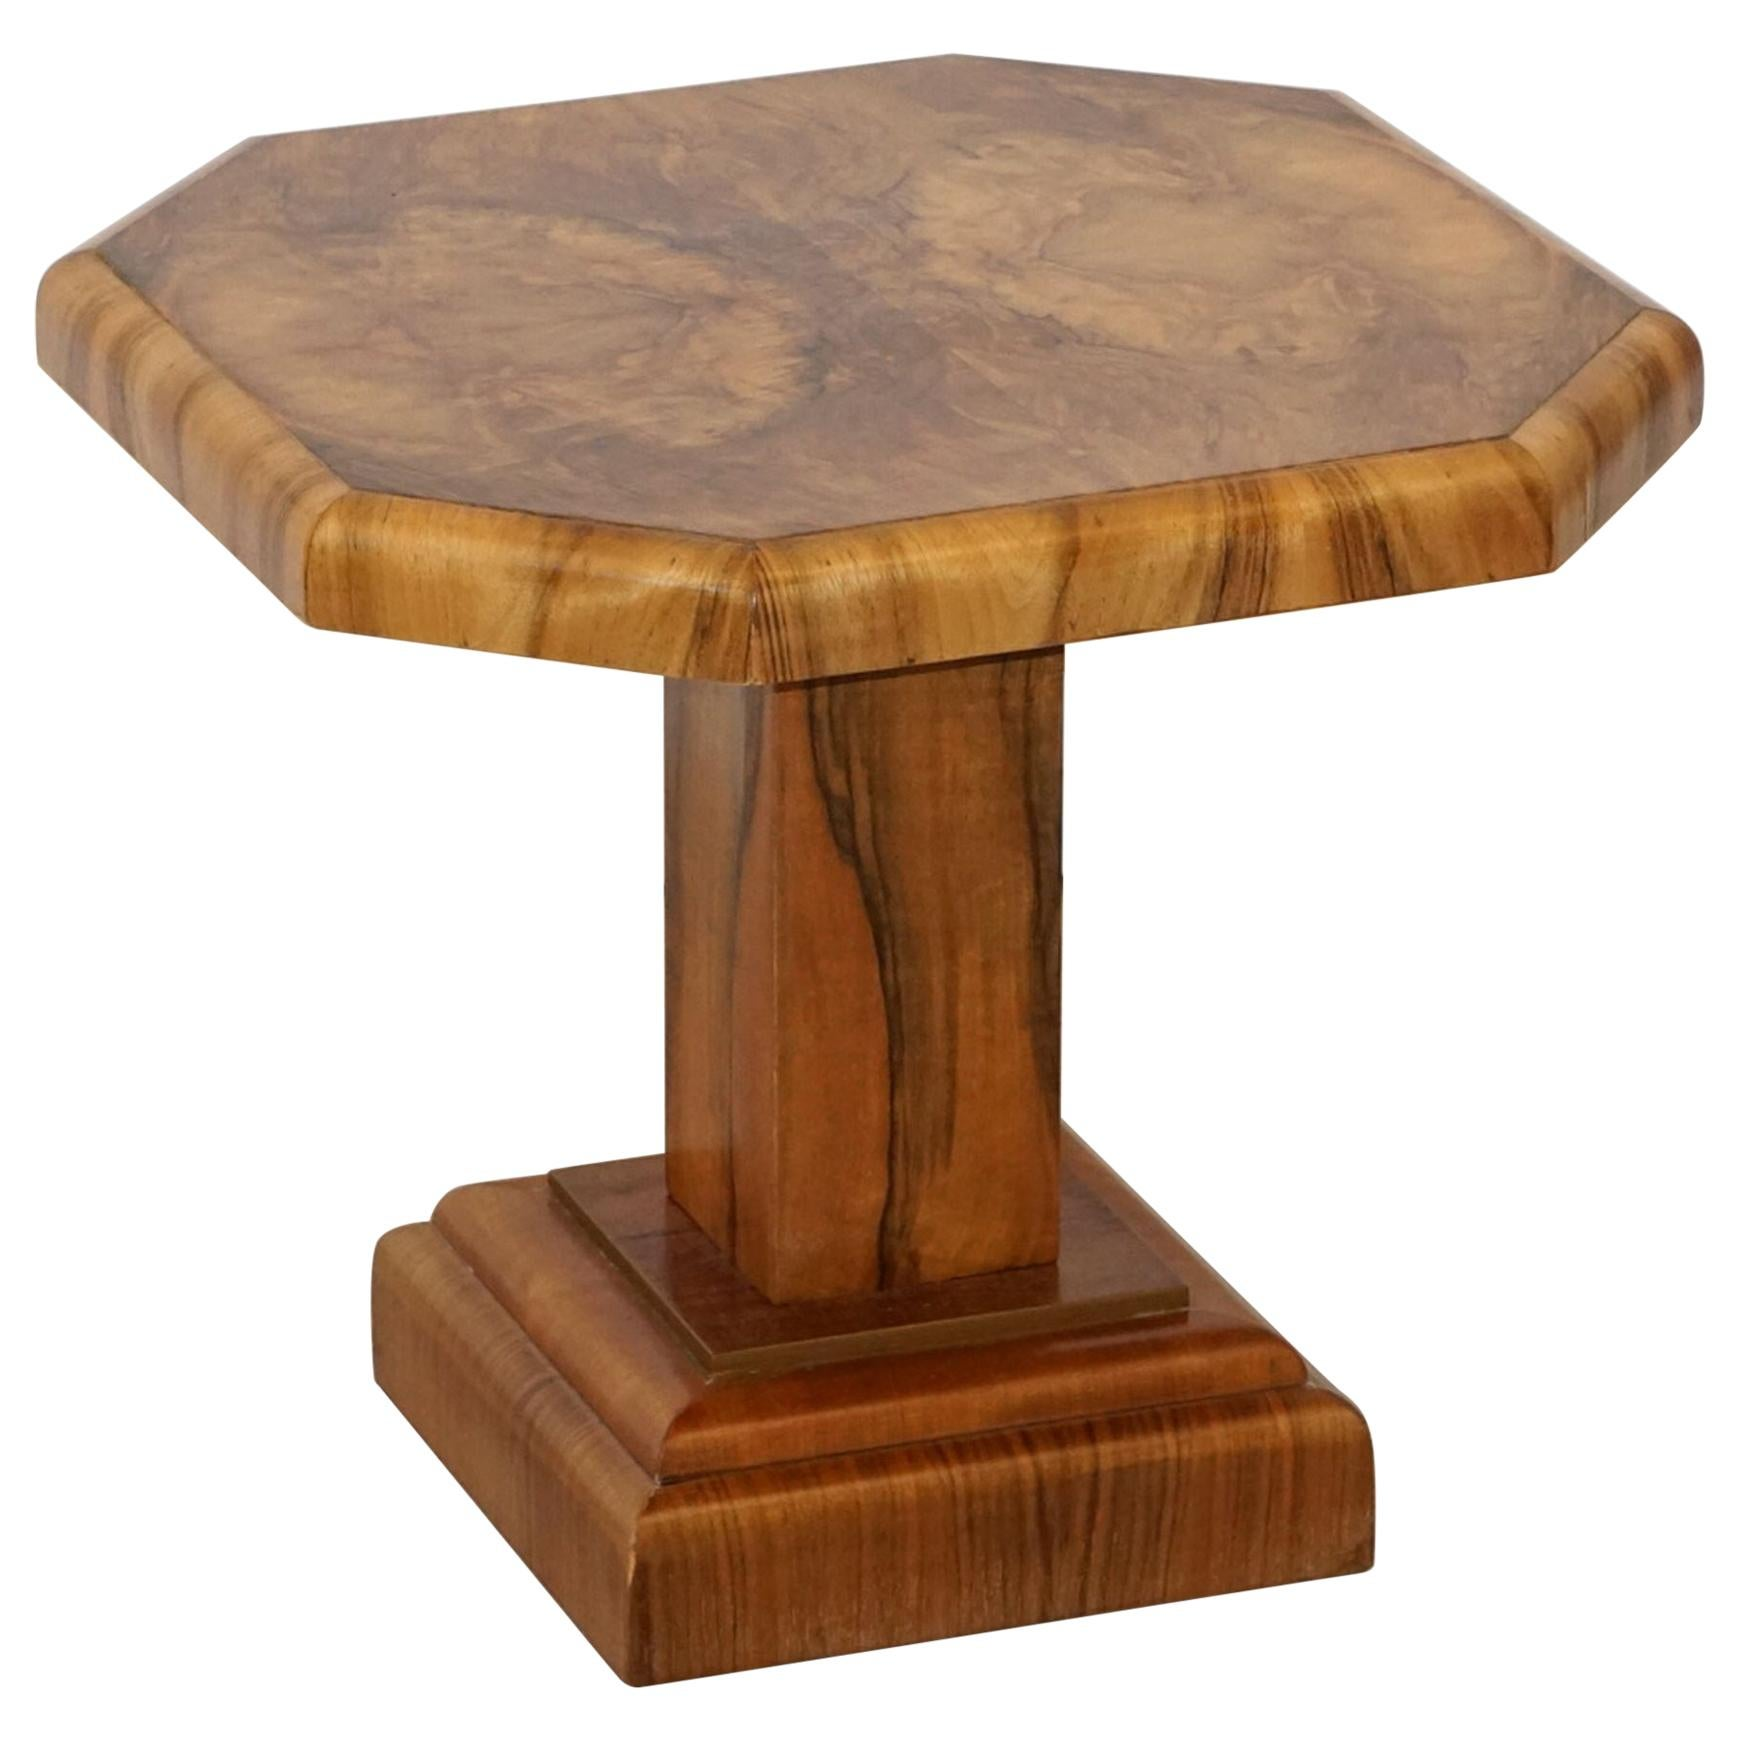 Art Deco Octagonal Table with Burr Walnut Veneer from England